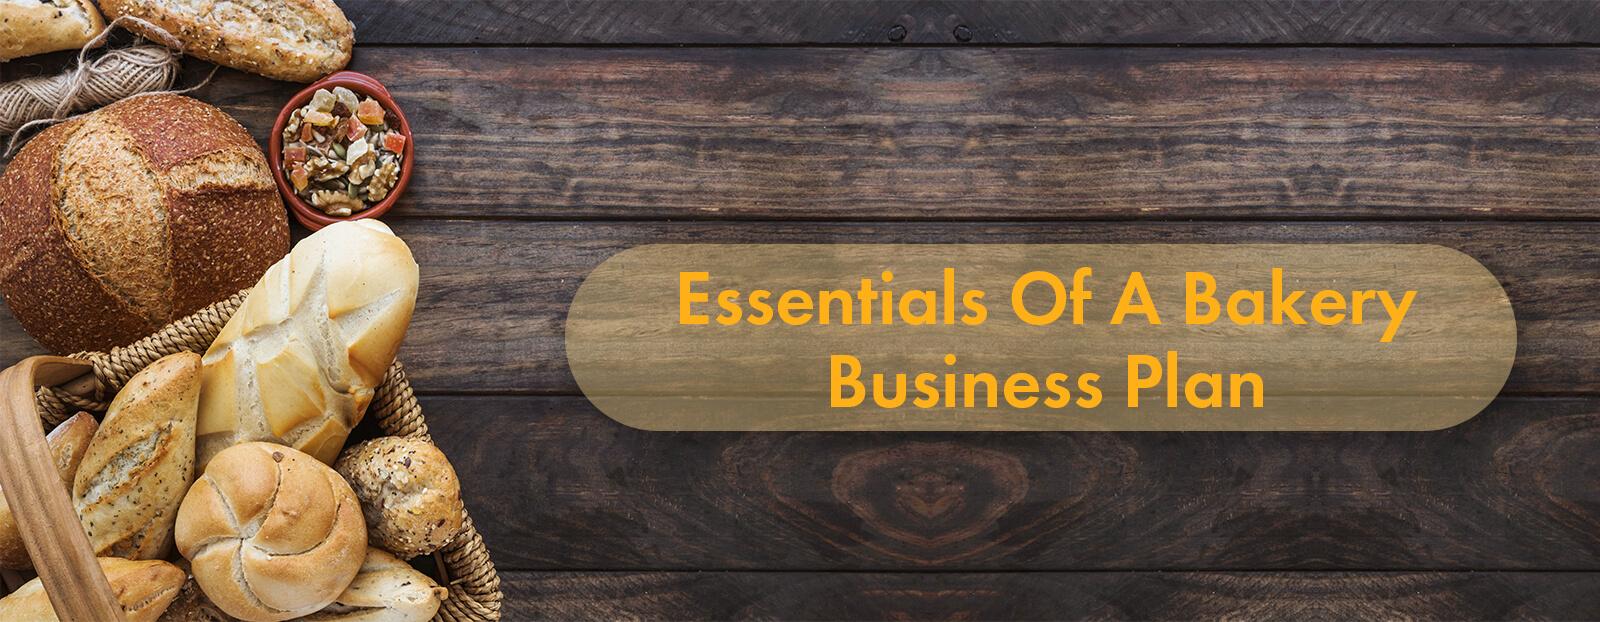 Essentials Of A Bakery Business Plan